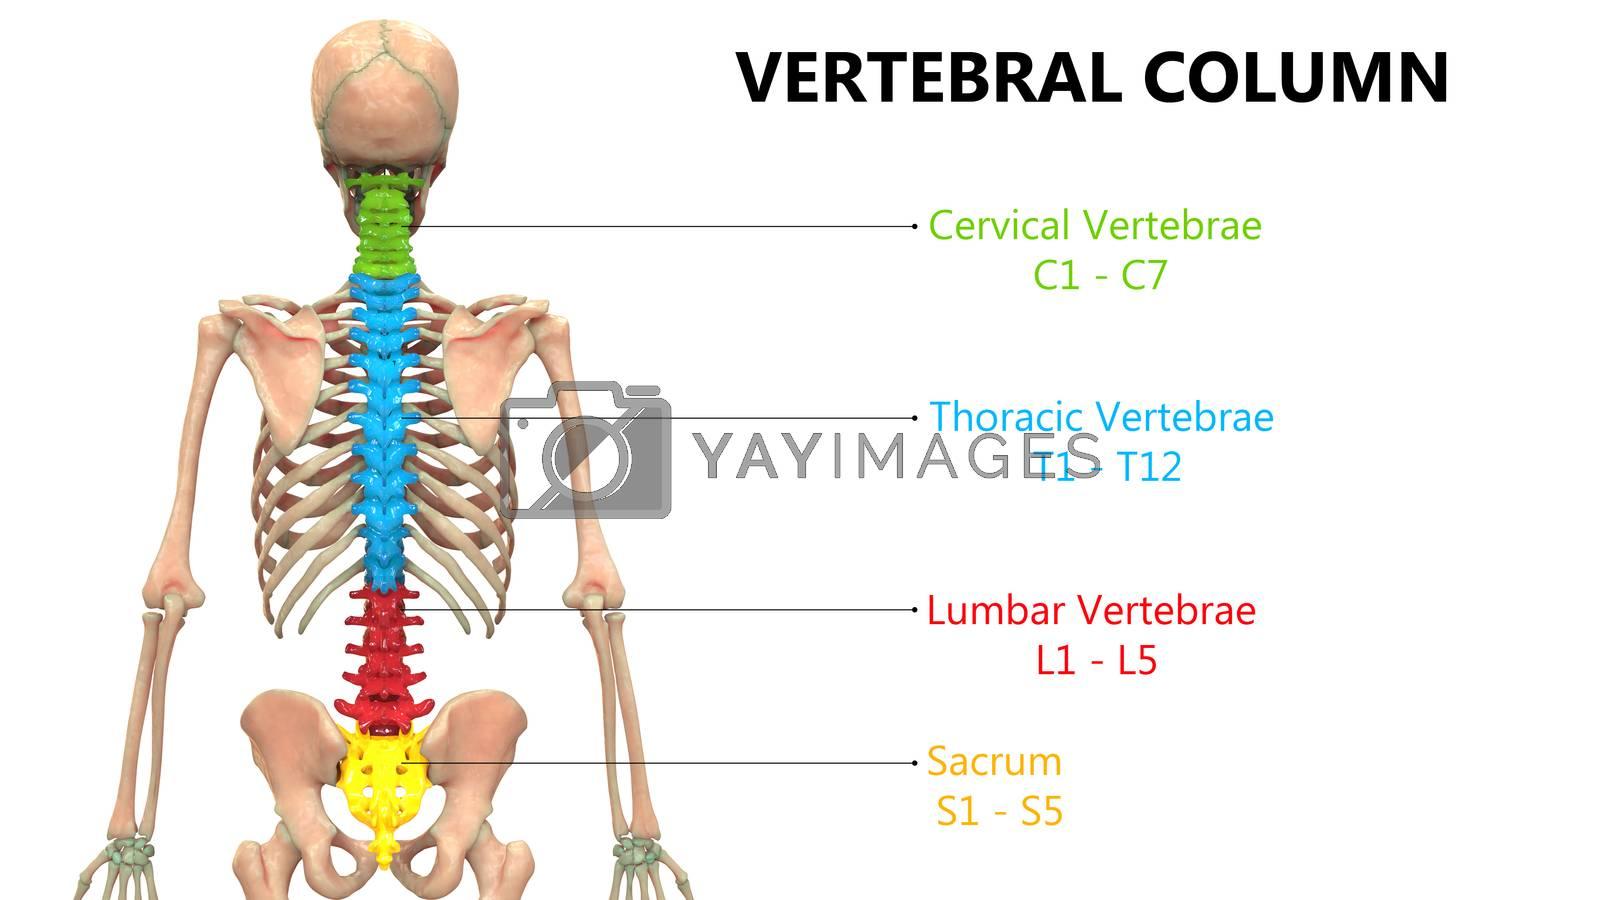 3D Illustration Concept of Vertebral Column of Human Skeleton System Described with Labels Anatomy Posterior View